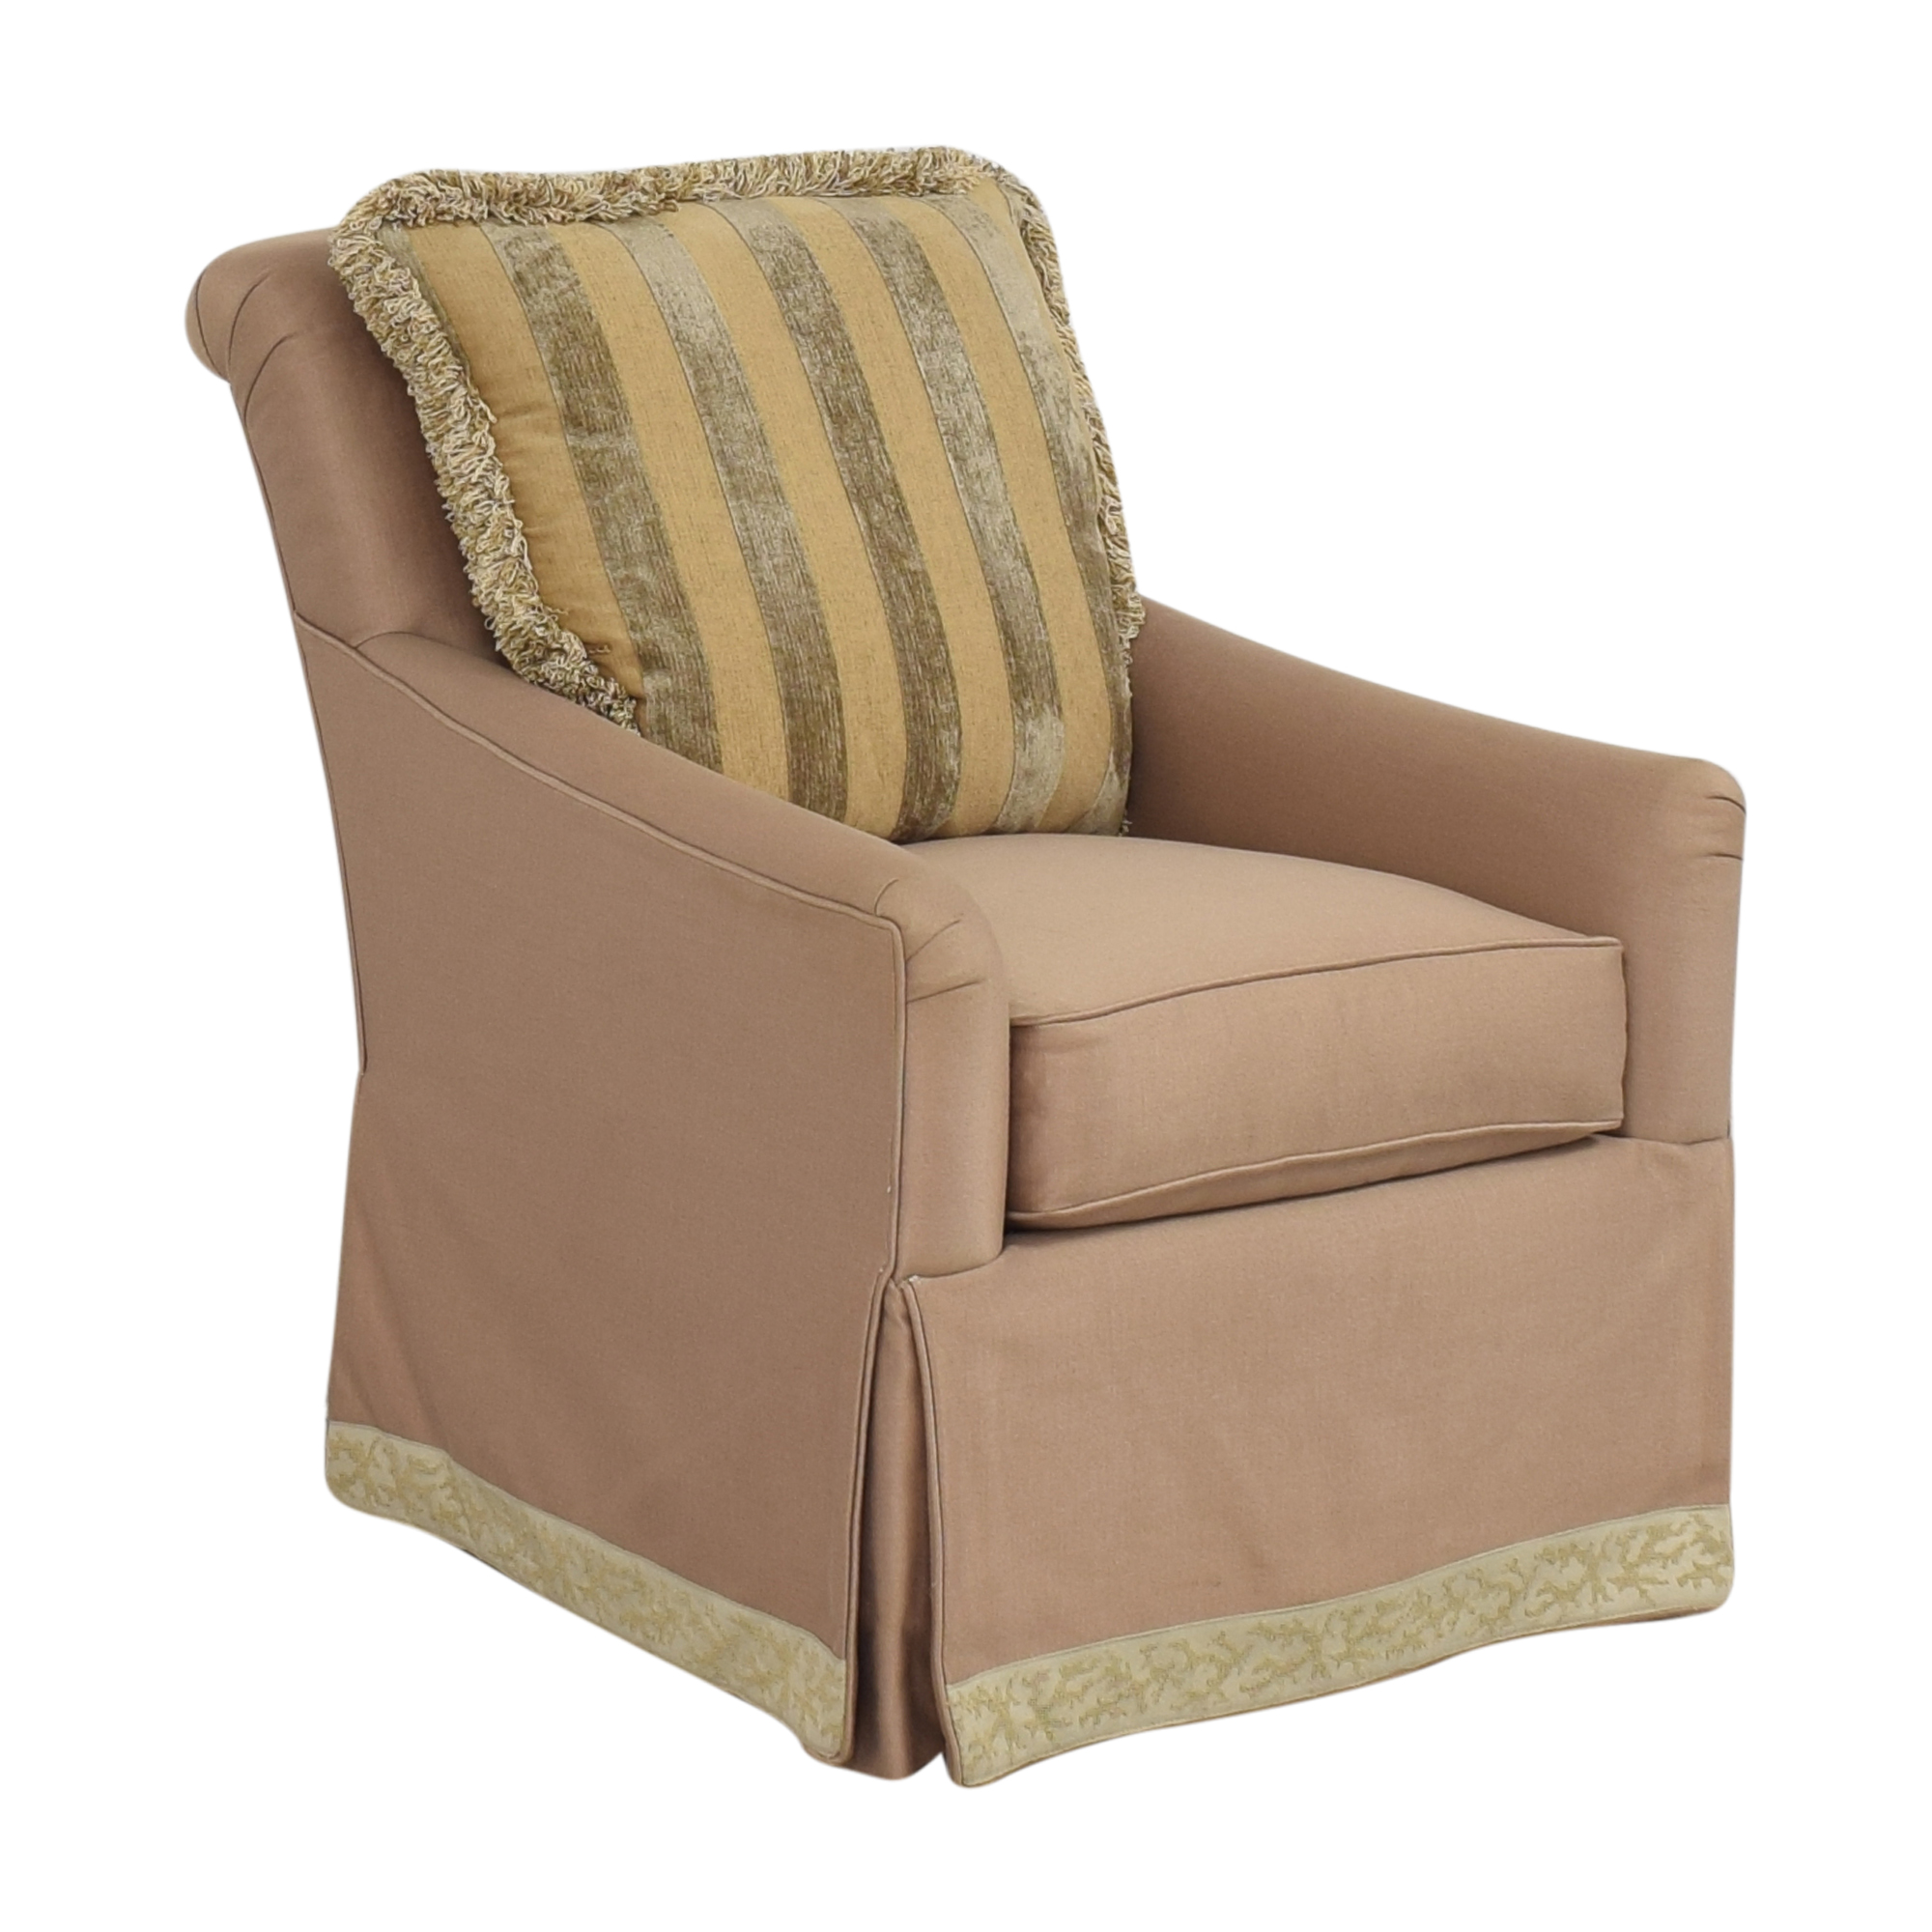 Tomlinson Tomlinson Erwin-Lambeth Upholstered Swivel Chair second hand